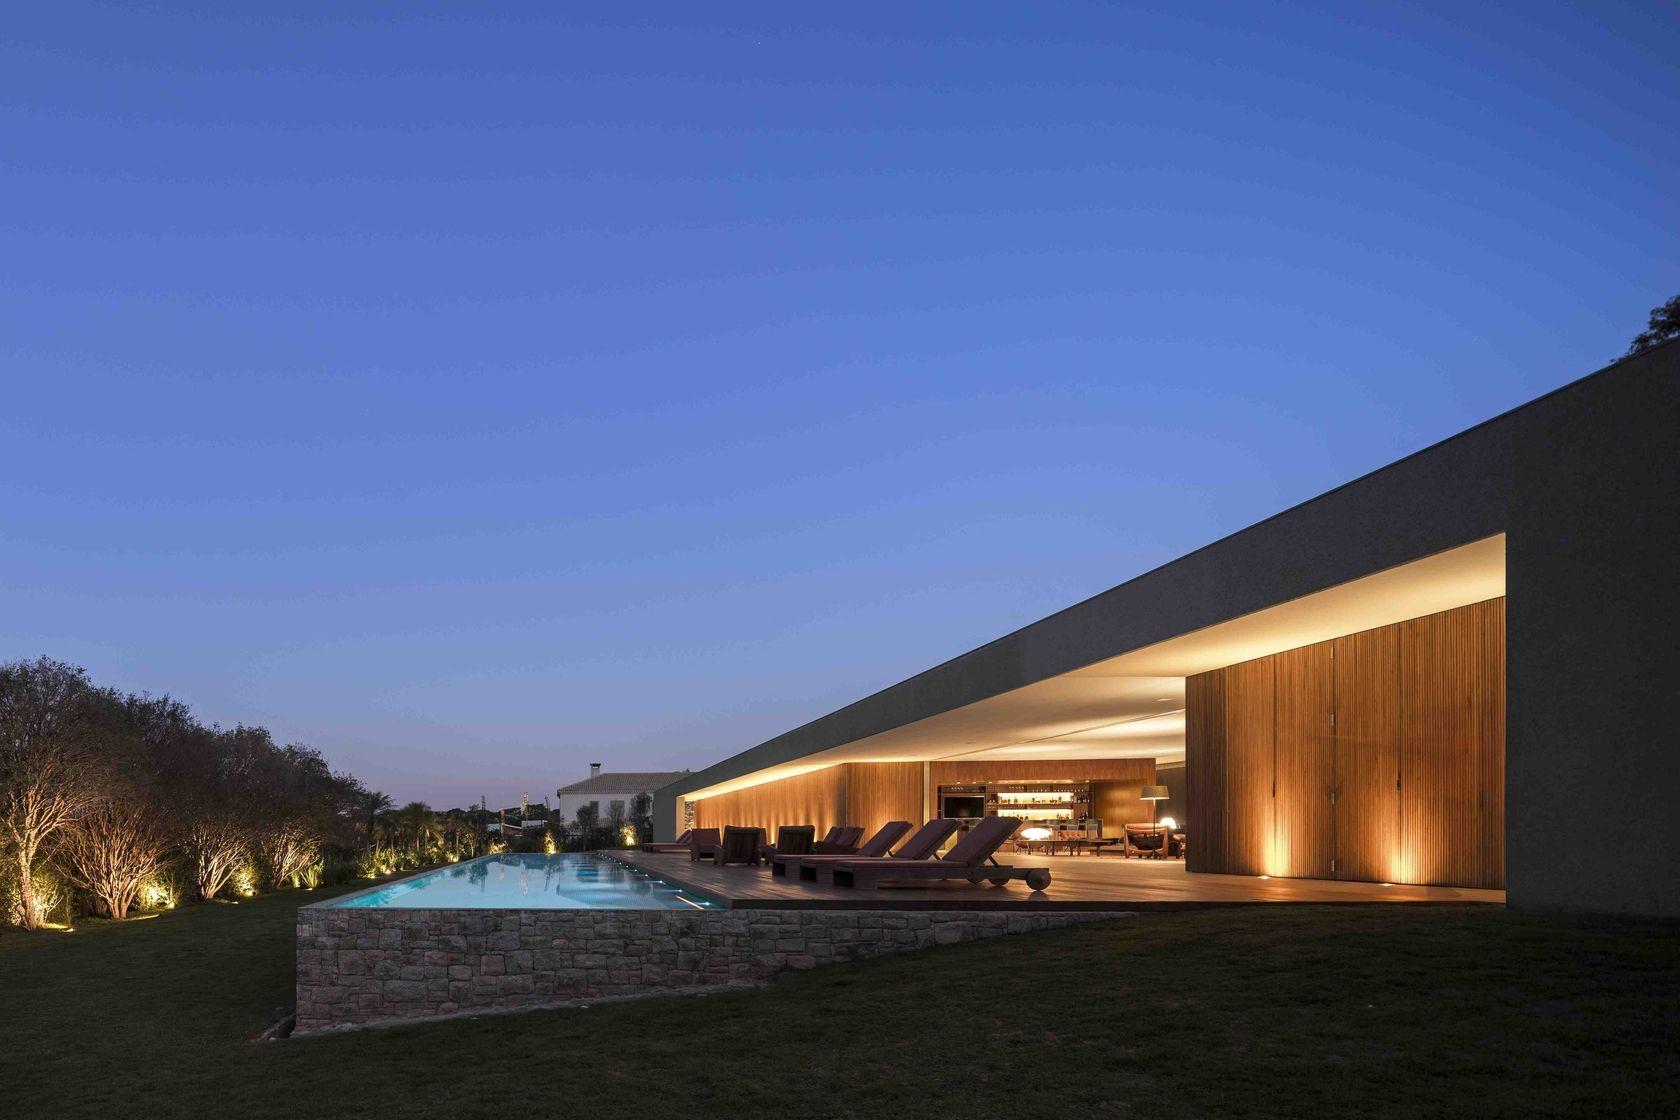 Luxury concrete house large courtyard fabulous fortress in brazil modern architecture casa lee porto feliz sp brazil